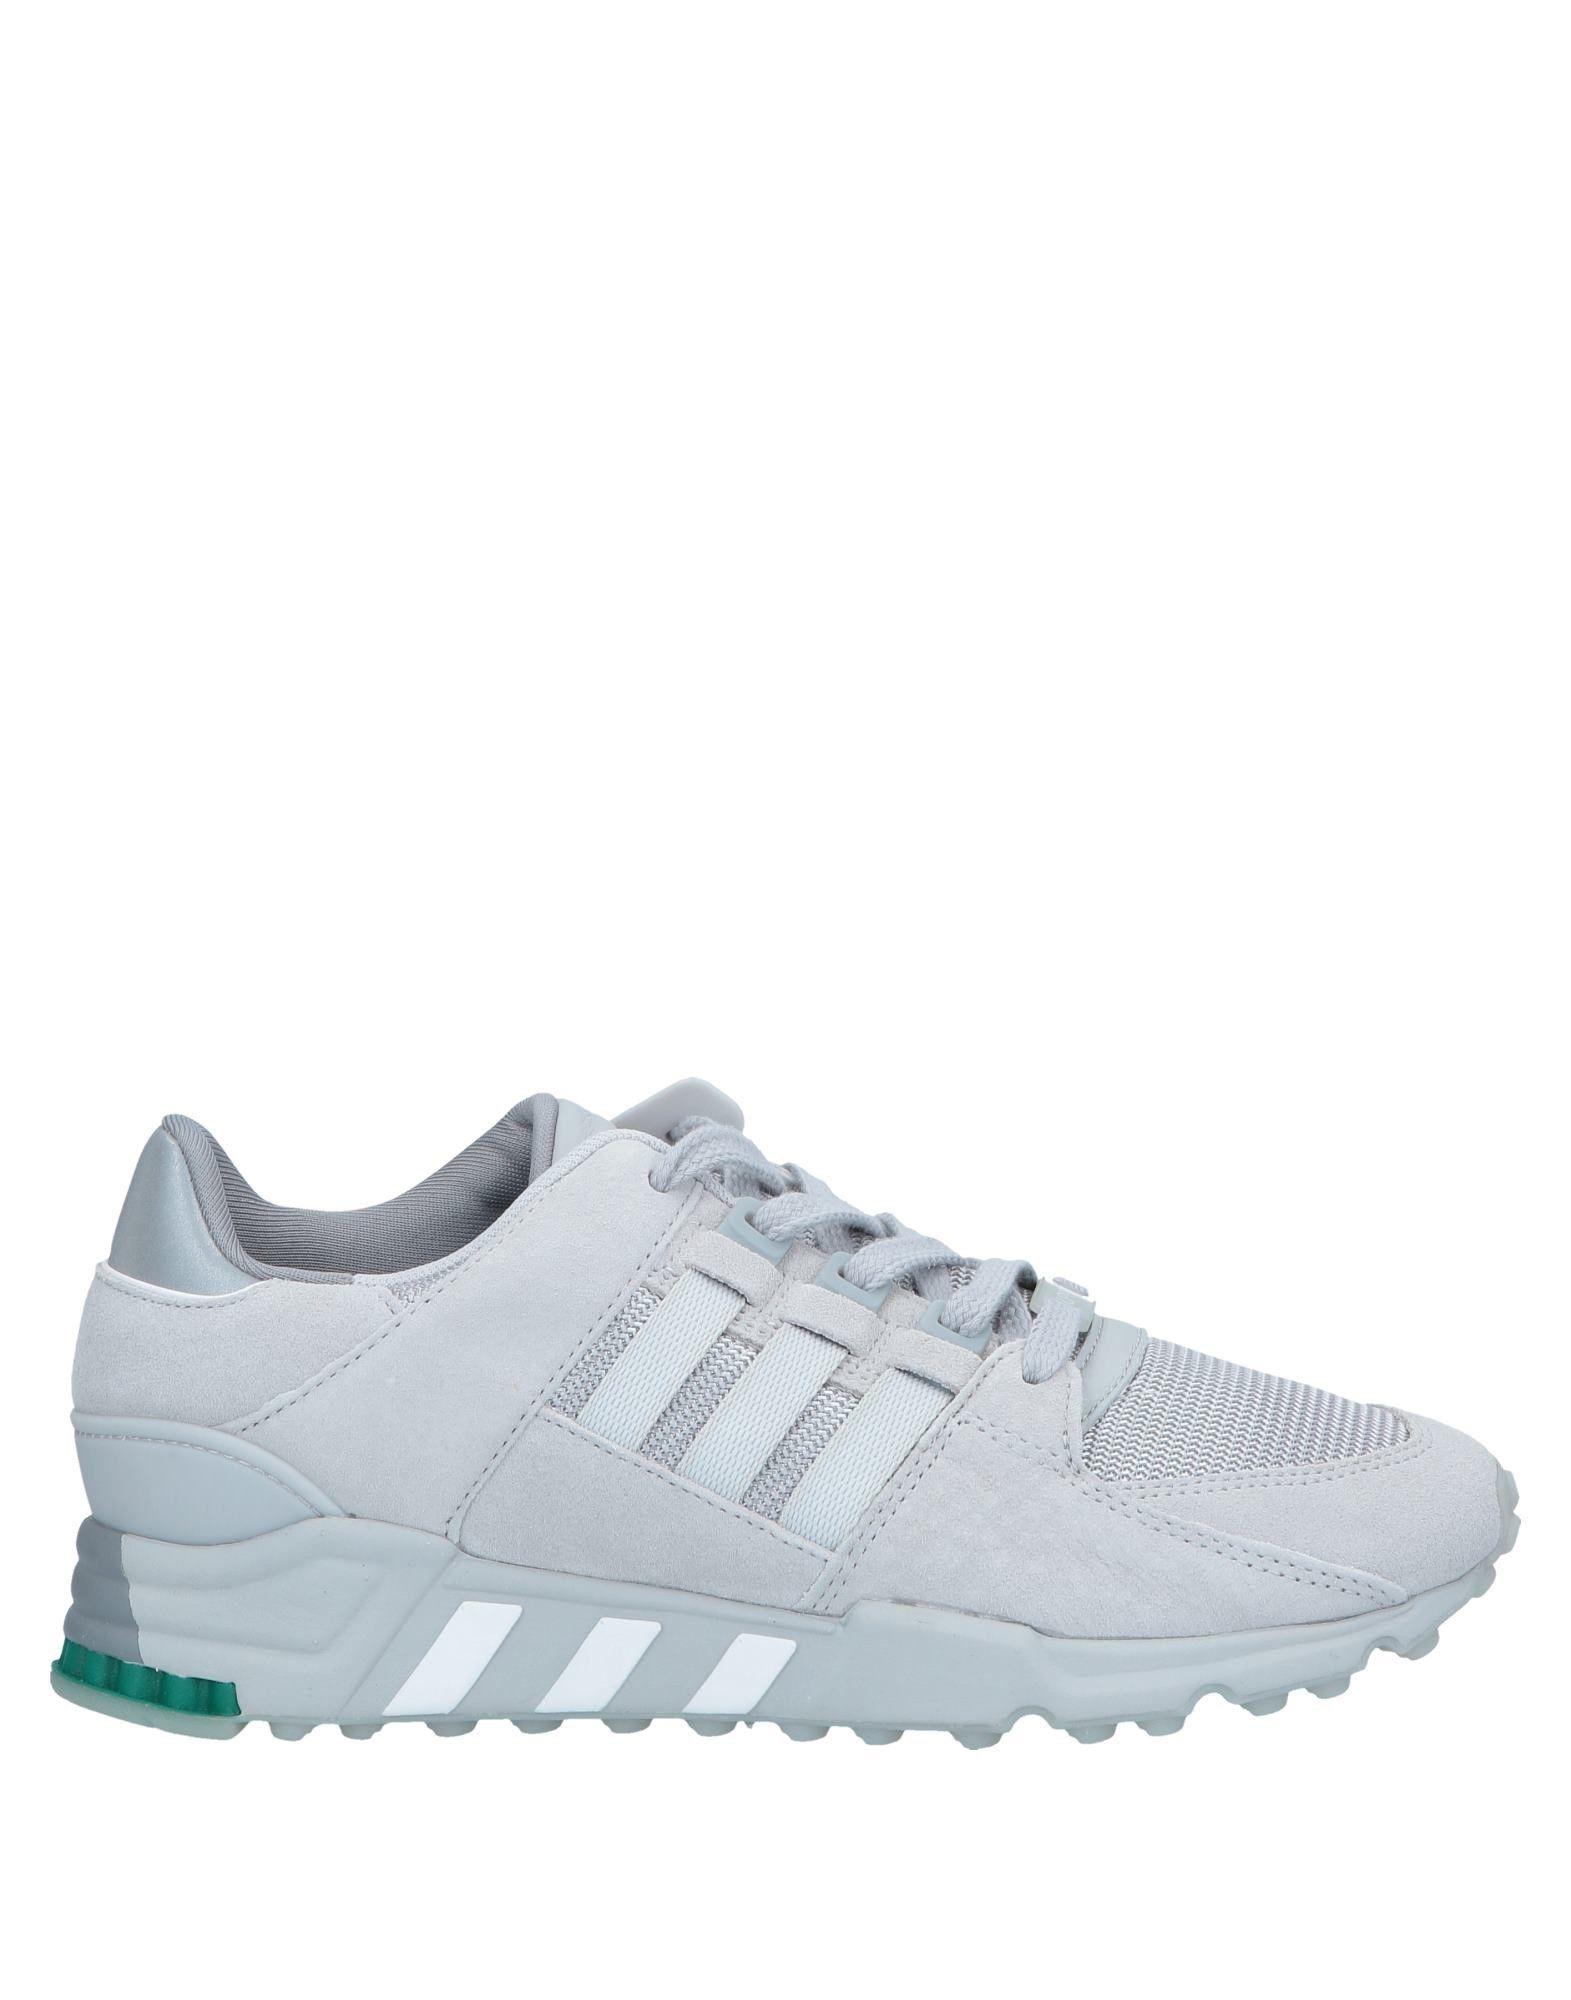 Turnschuhe Adidas Originals herren - 11642837JJ